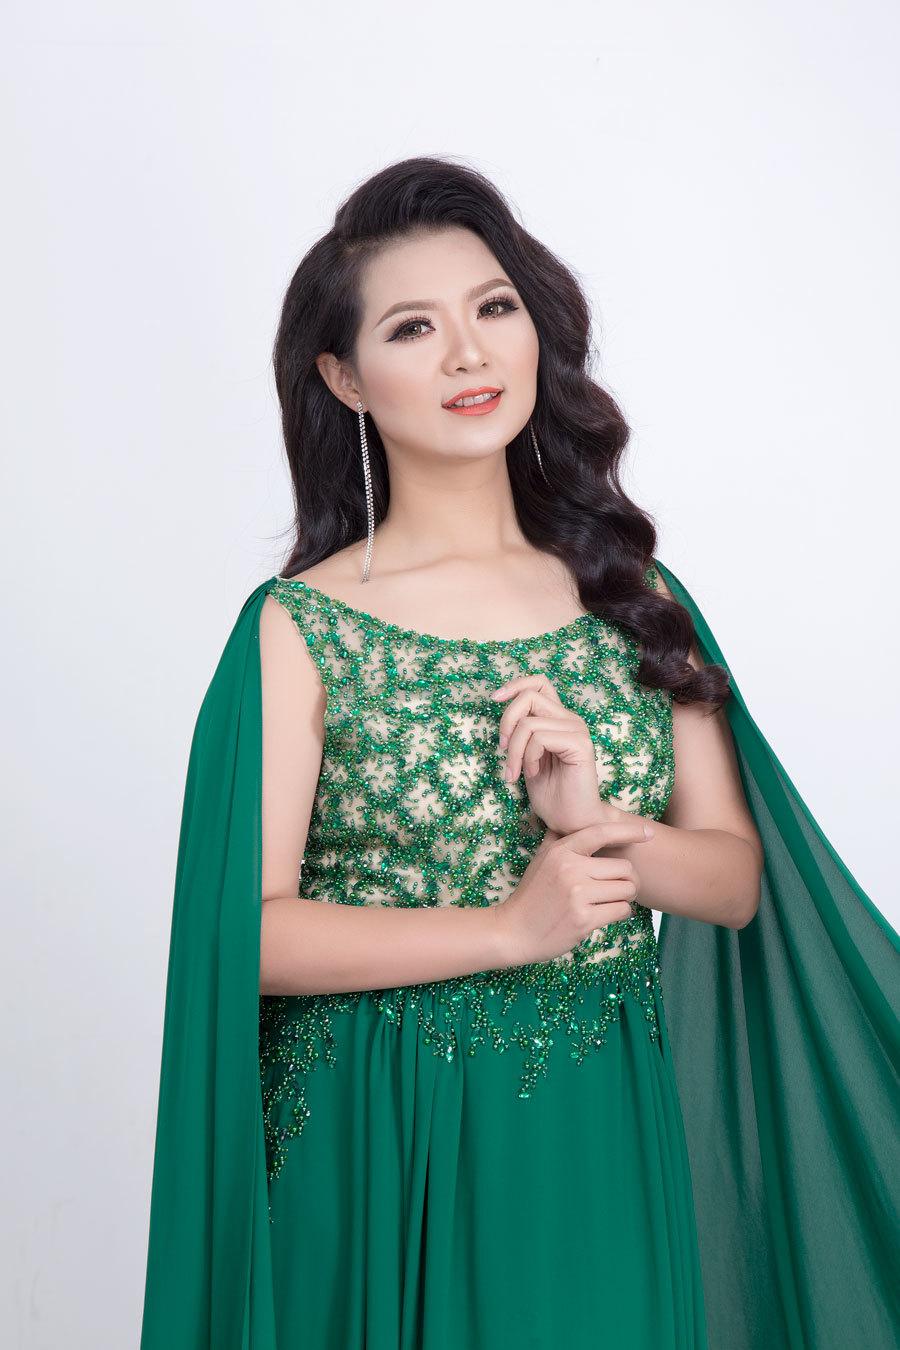 Triệu Trang